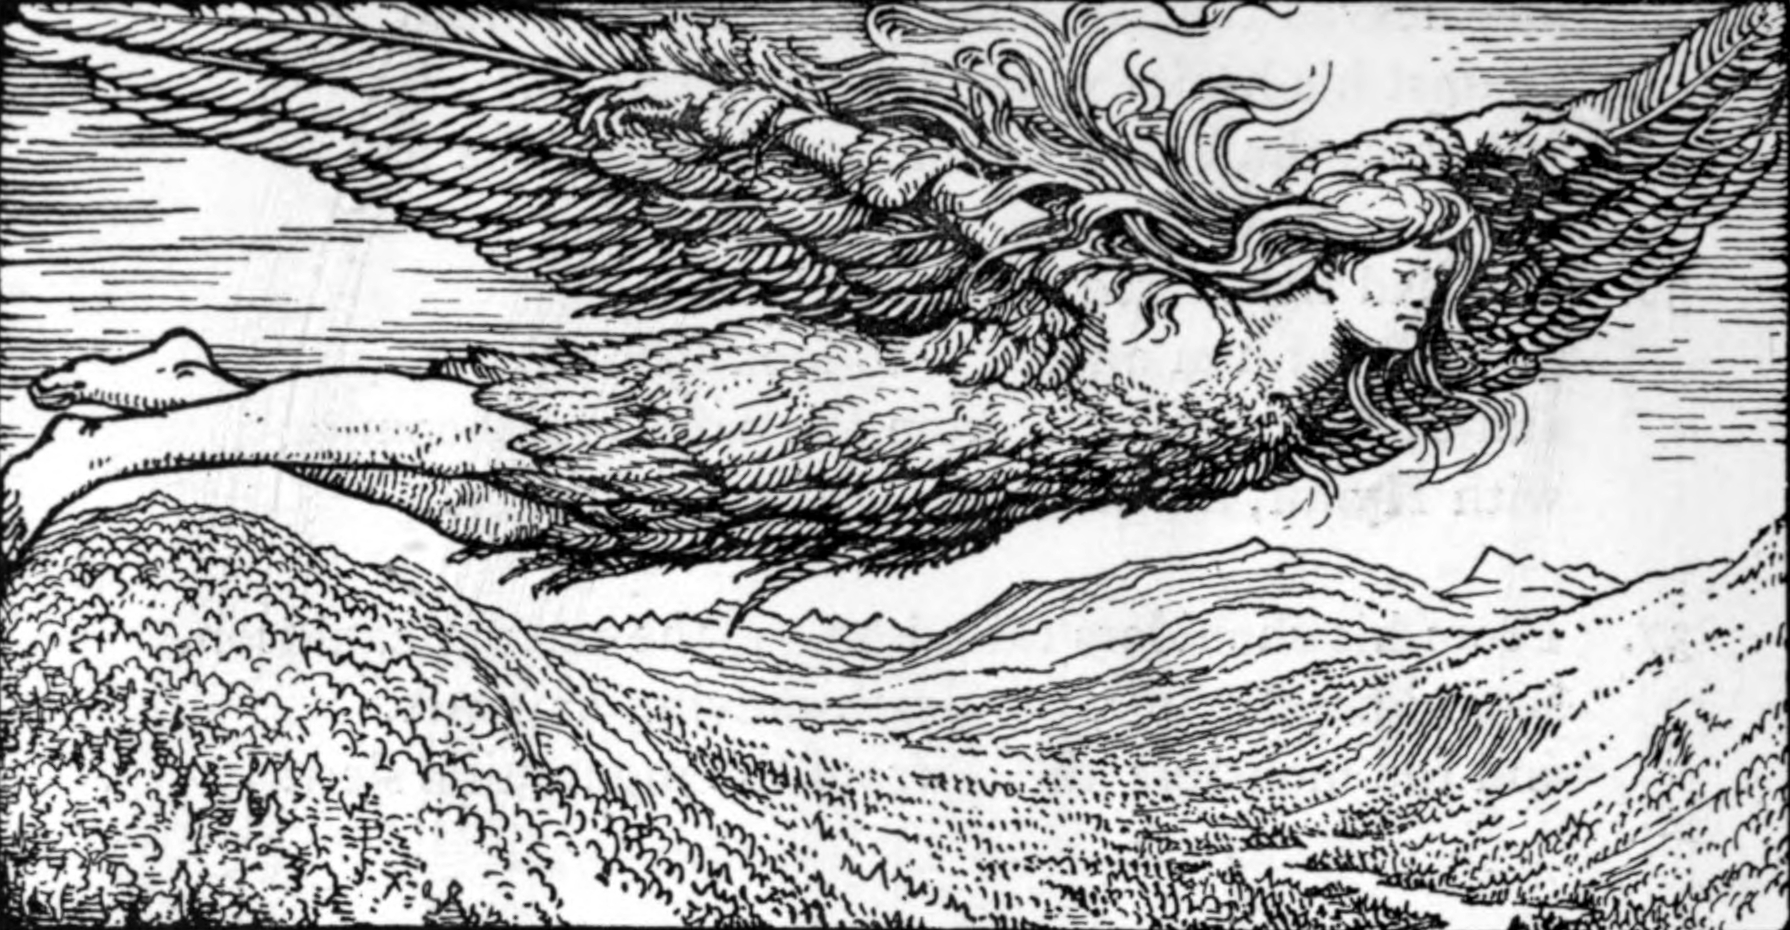 Loki bay tới Jötunheimr (1908) – tranh của W.G. Collingwood